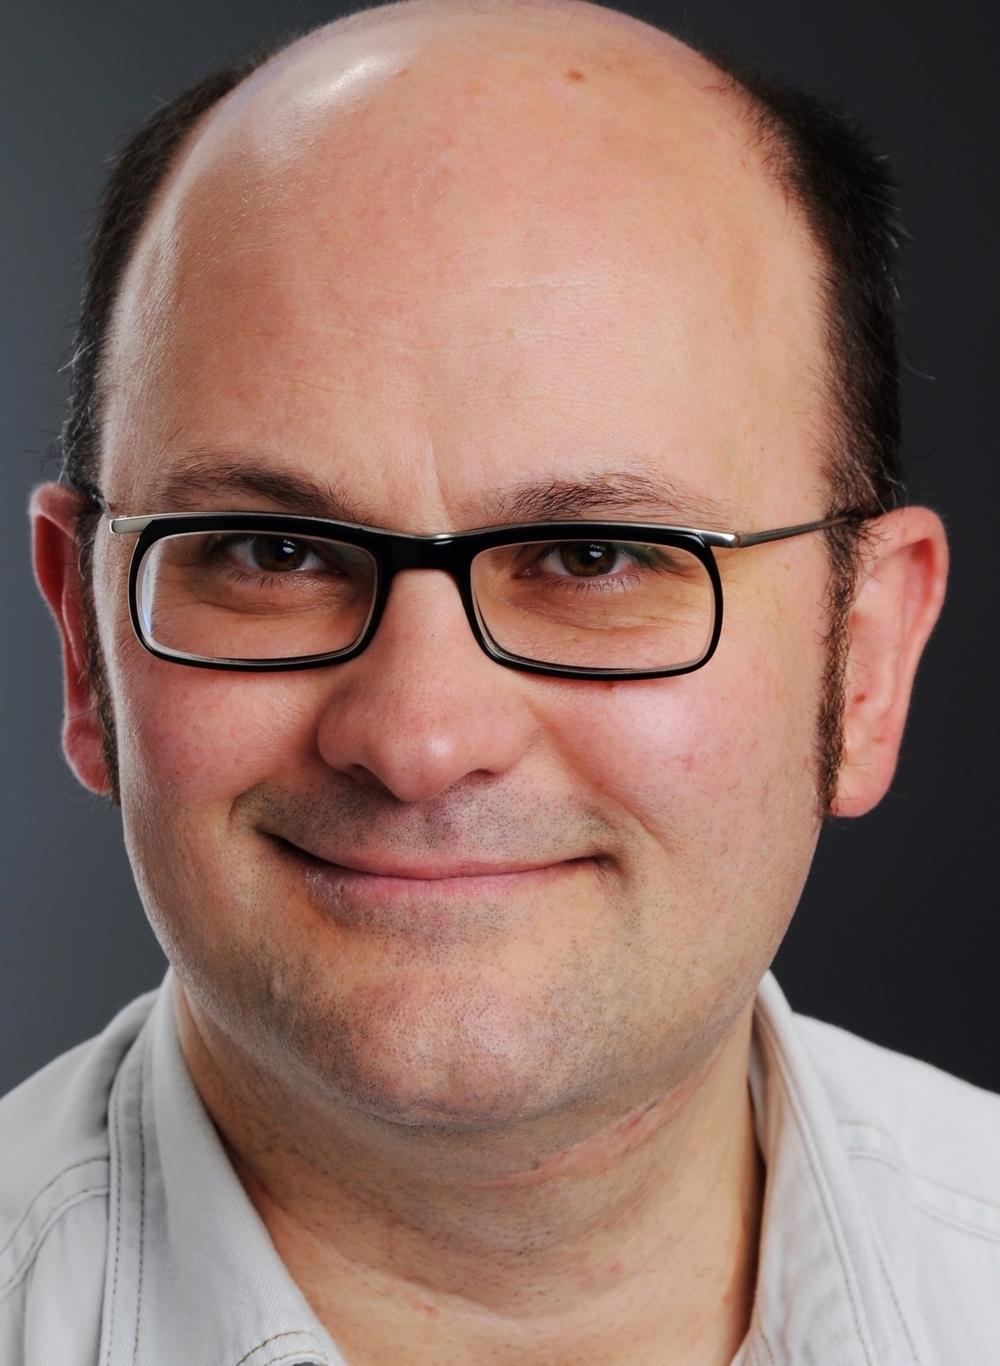 Josip Korbar - Admin Affairs/Actor josip.korbar@opendoortheatre.uk.com